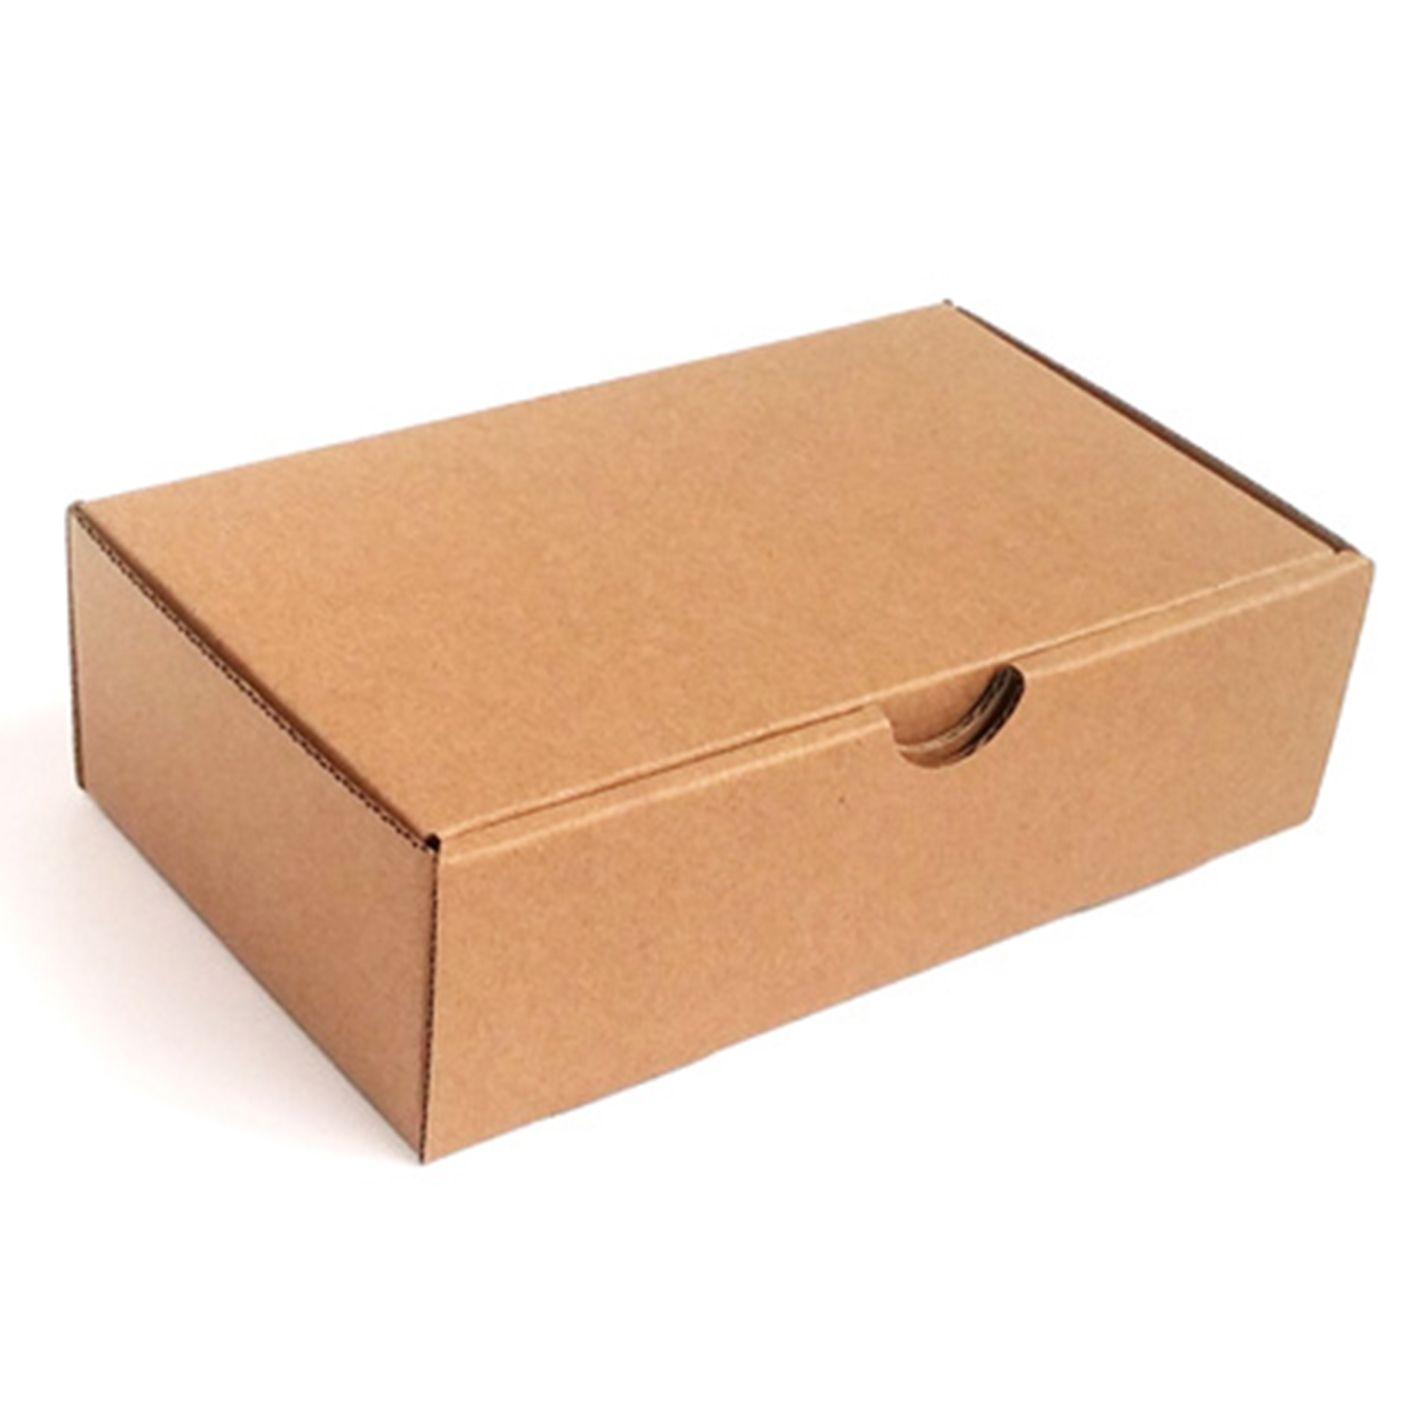 Box style: Corrugated box Material: K9K board Printing: 0C X 0C